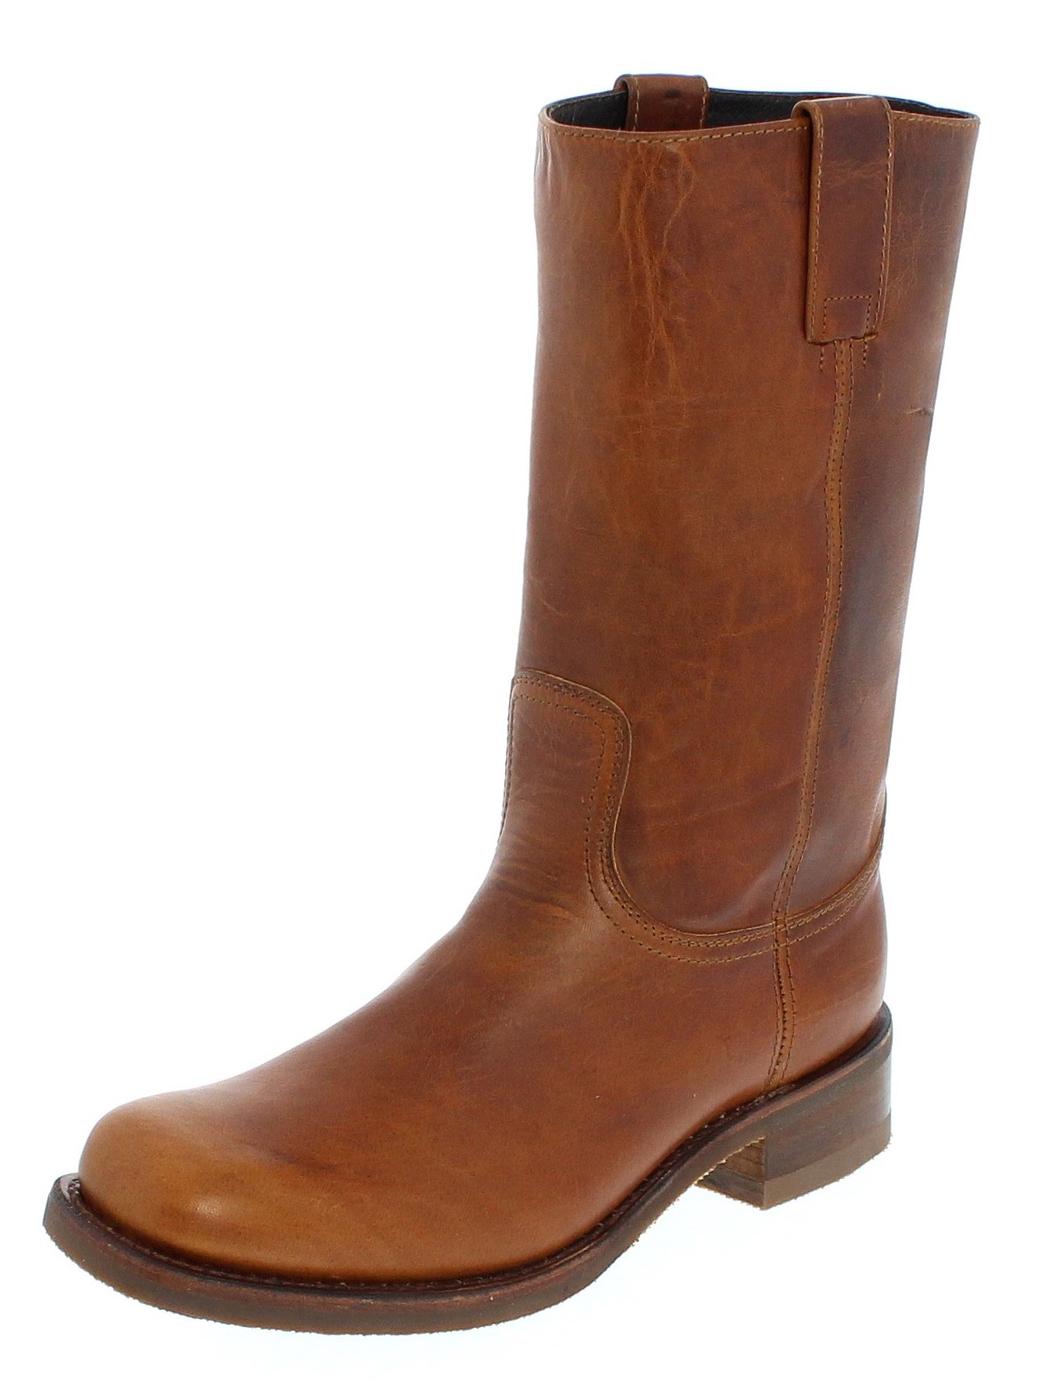 Sendra Boots 3162 Loren Teak Farm & Ranch Boot - Brown